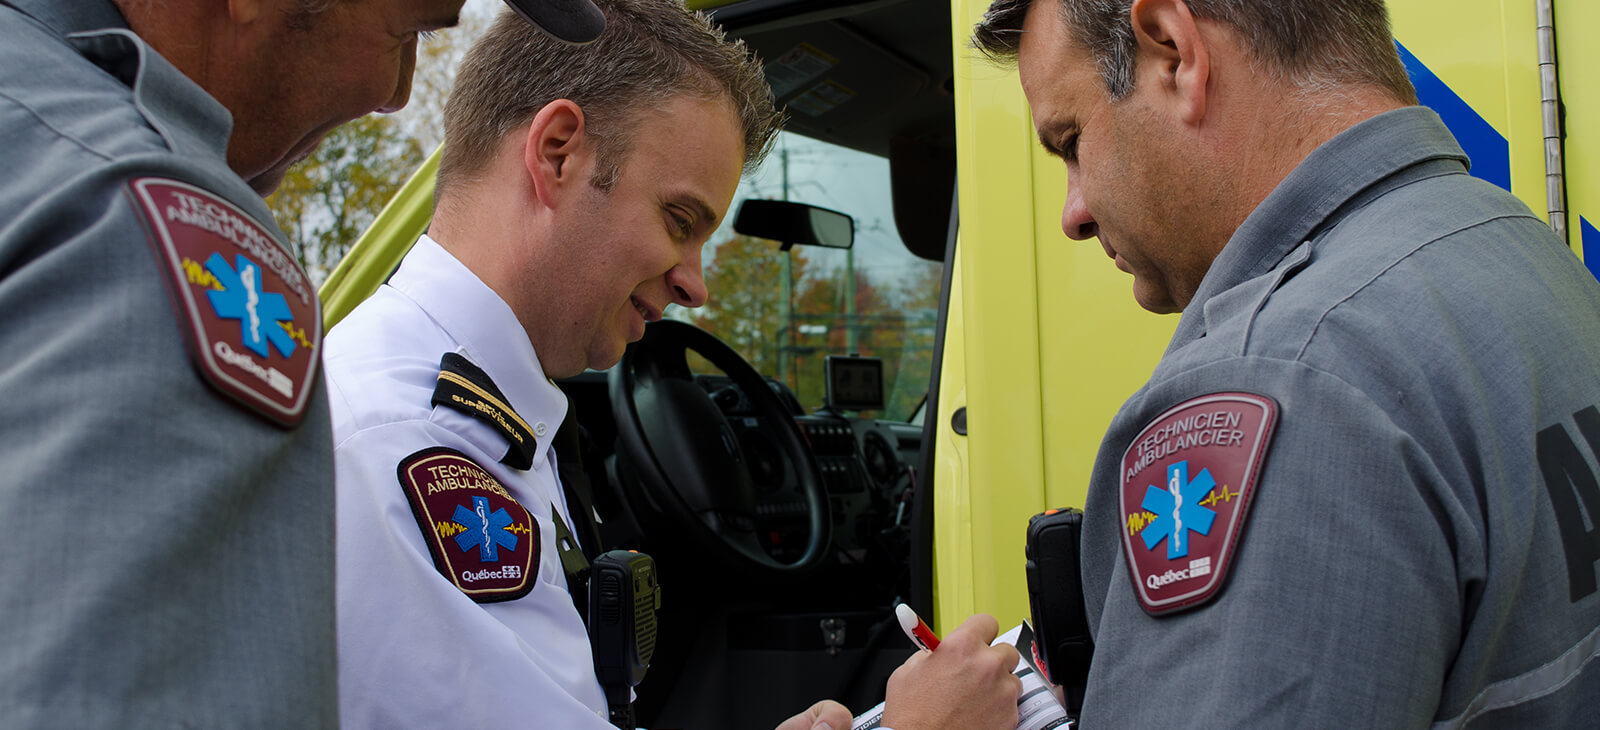 Superviseur et paramédics (Photographe Vicky Brunoro-Laporte)